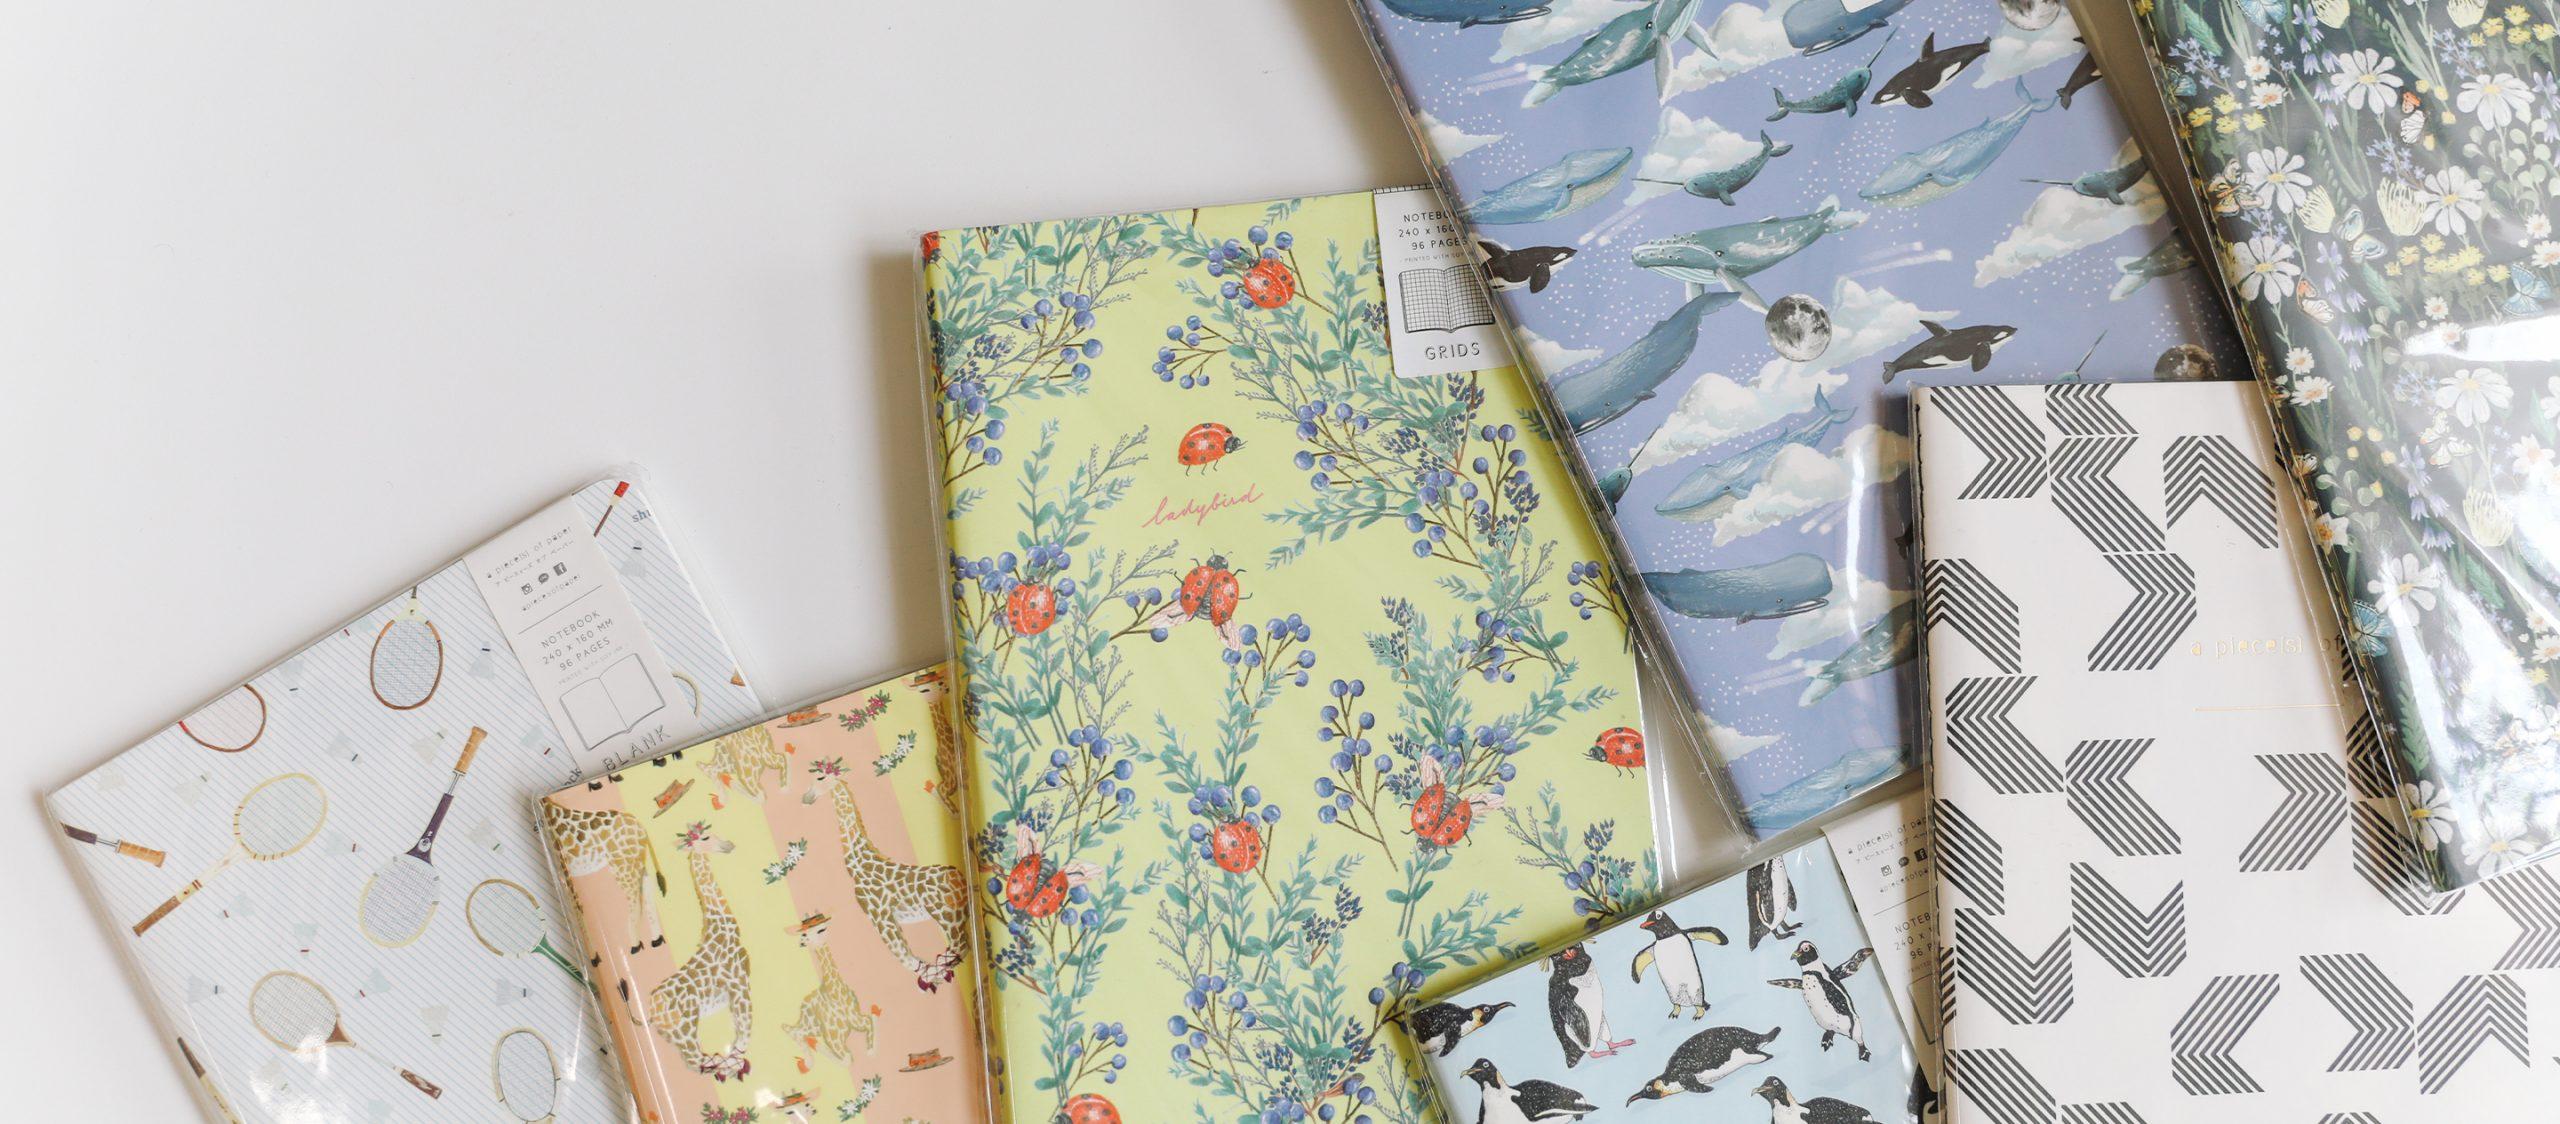 a piece(s) of paper แบรนด์ของคู่รักนักออกแบบ ที่ตั้งใจอยากให้กระดาษเป็นมากกว่ากระดาษ